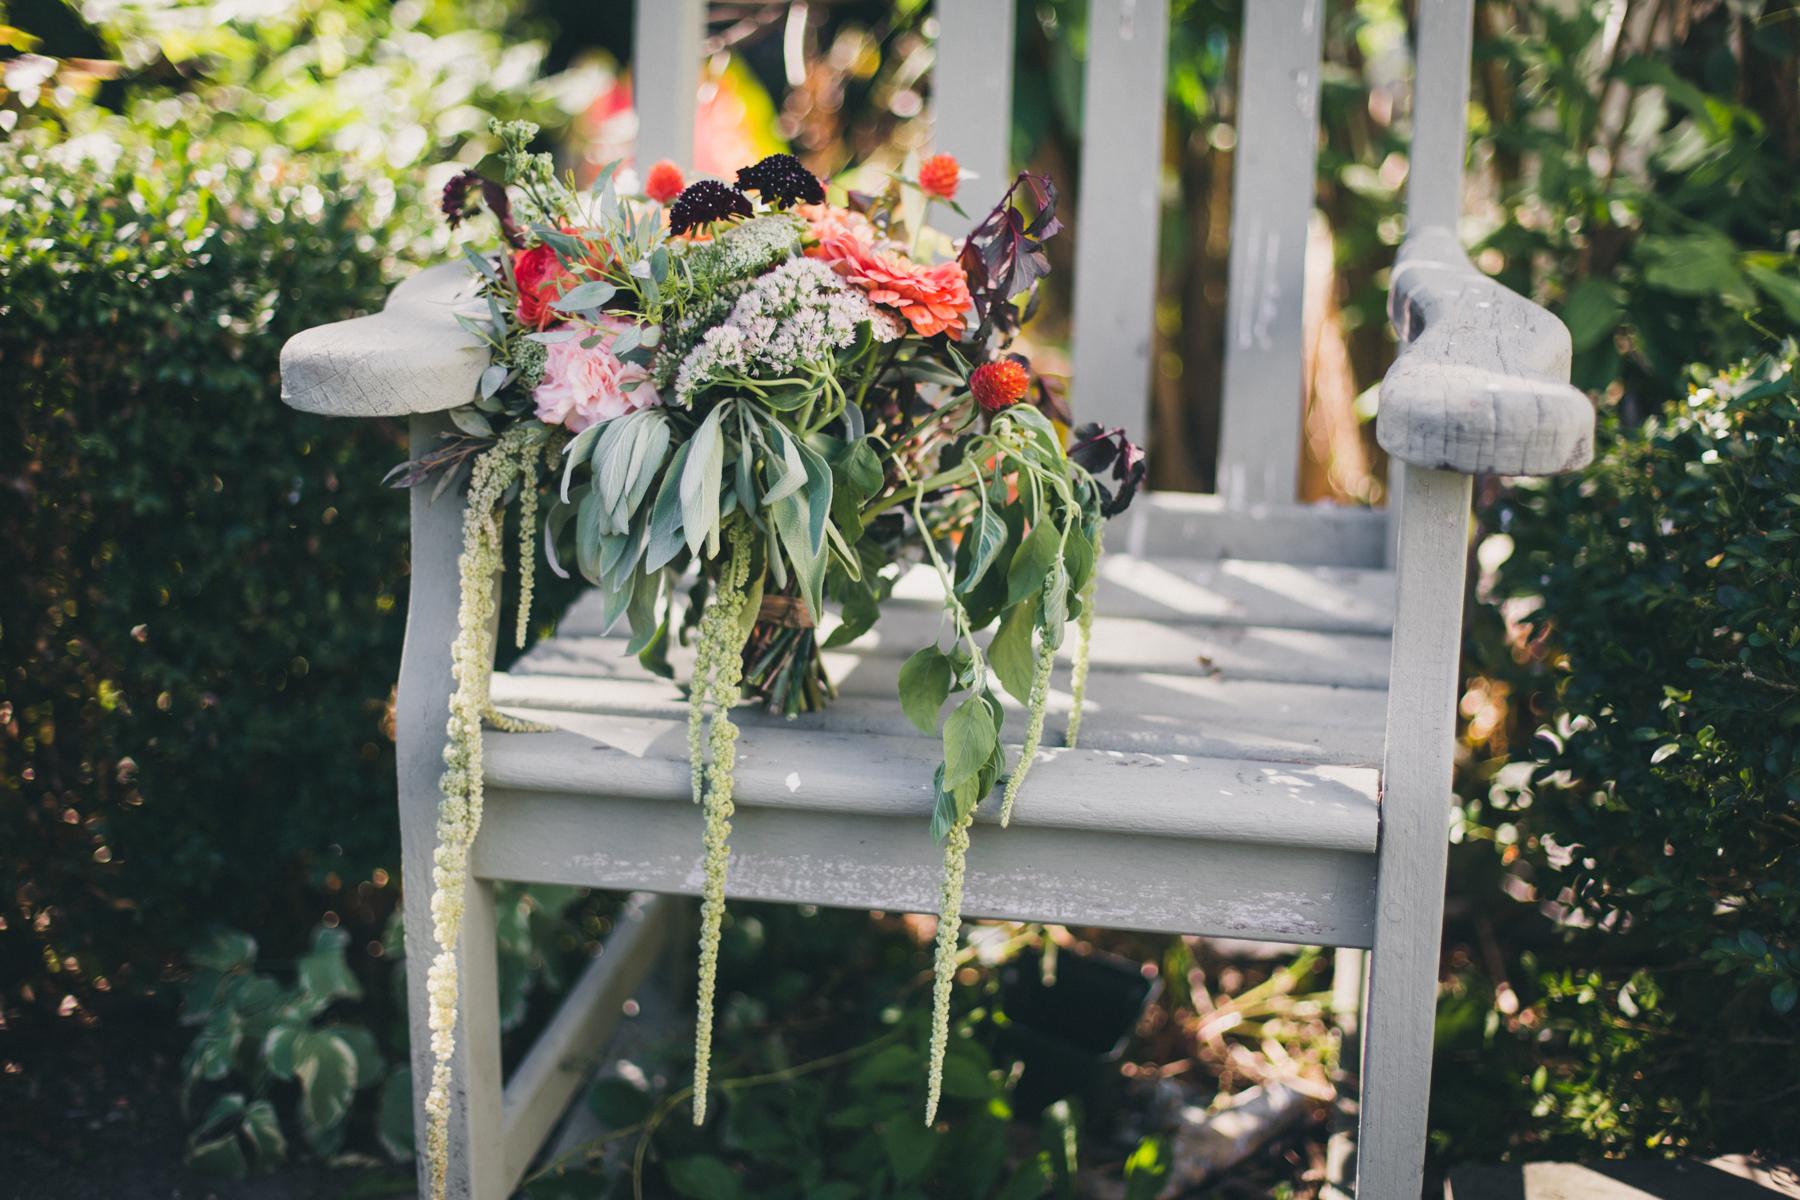 Long-Island-Documentary-Wedding-Photography-Summer-Tent-Wedding-in-New-York-82.jpg